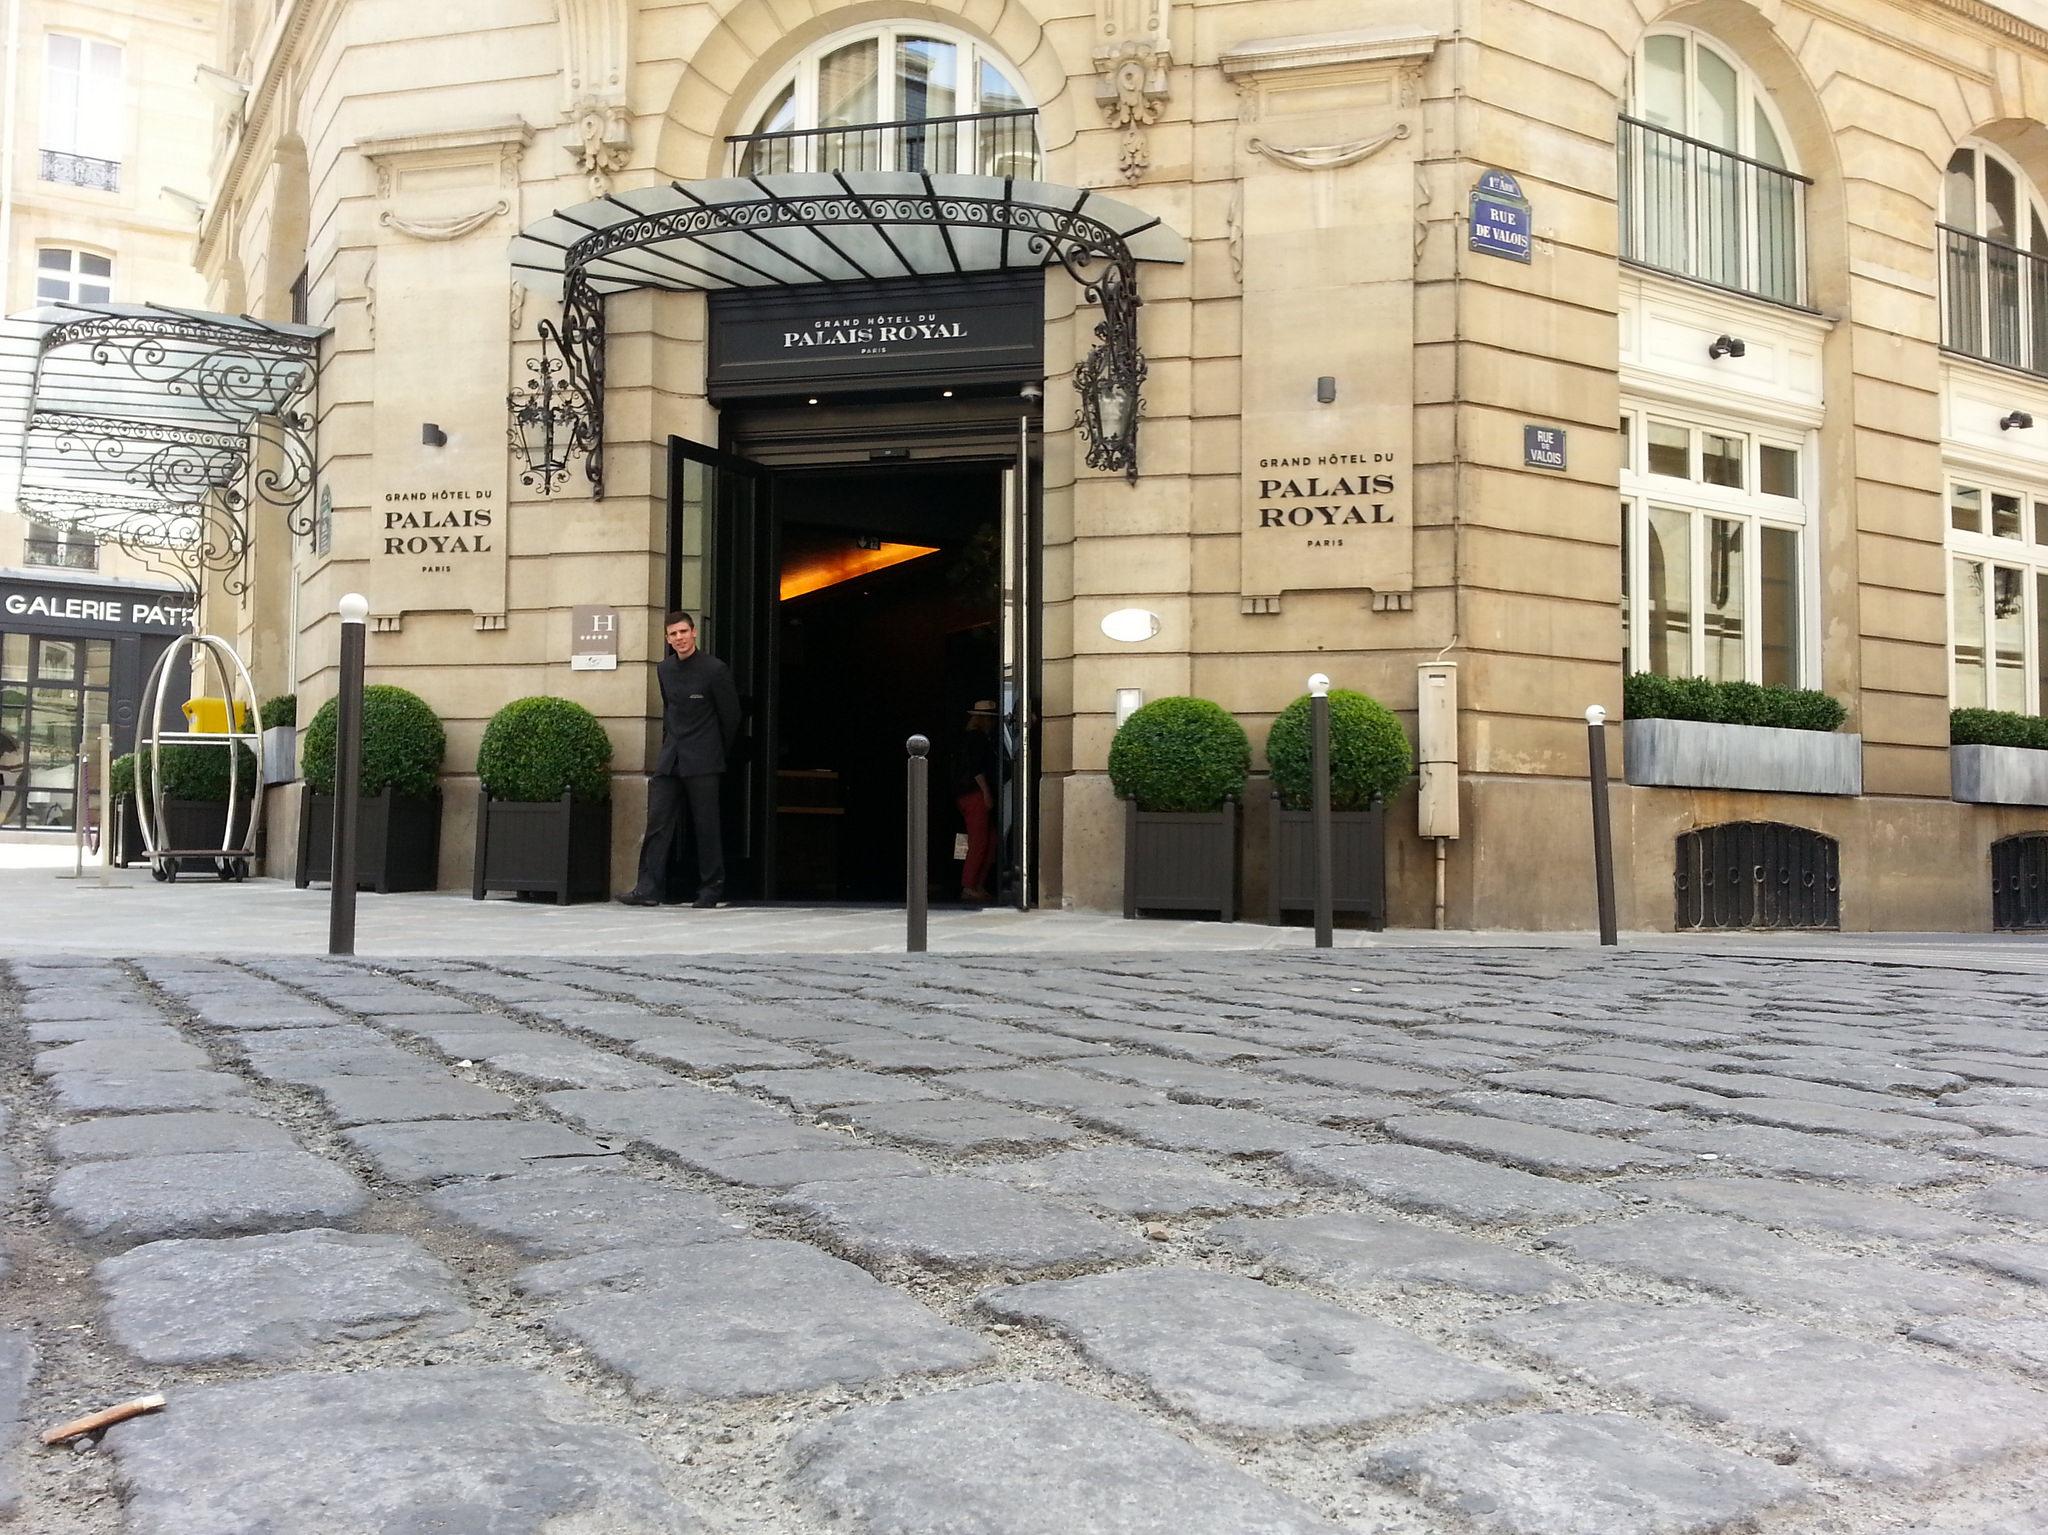 Luxury life for an afternoon le grand h tel du palais royal pr te moi paris - Grand hotel palais royal ...